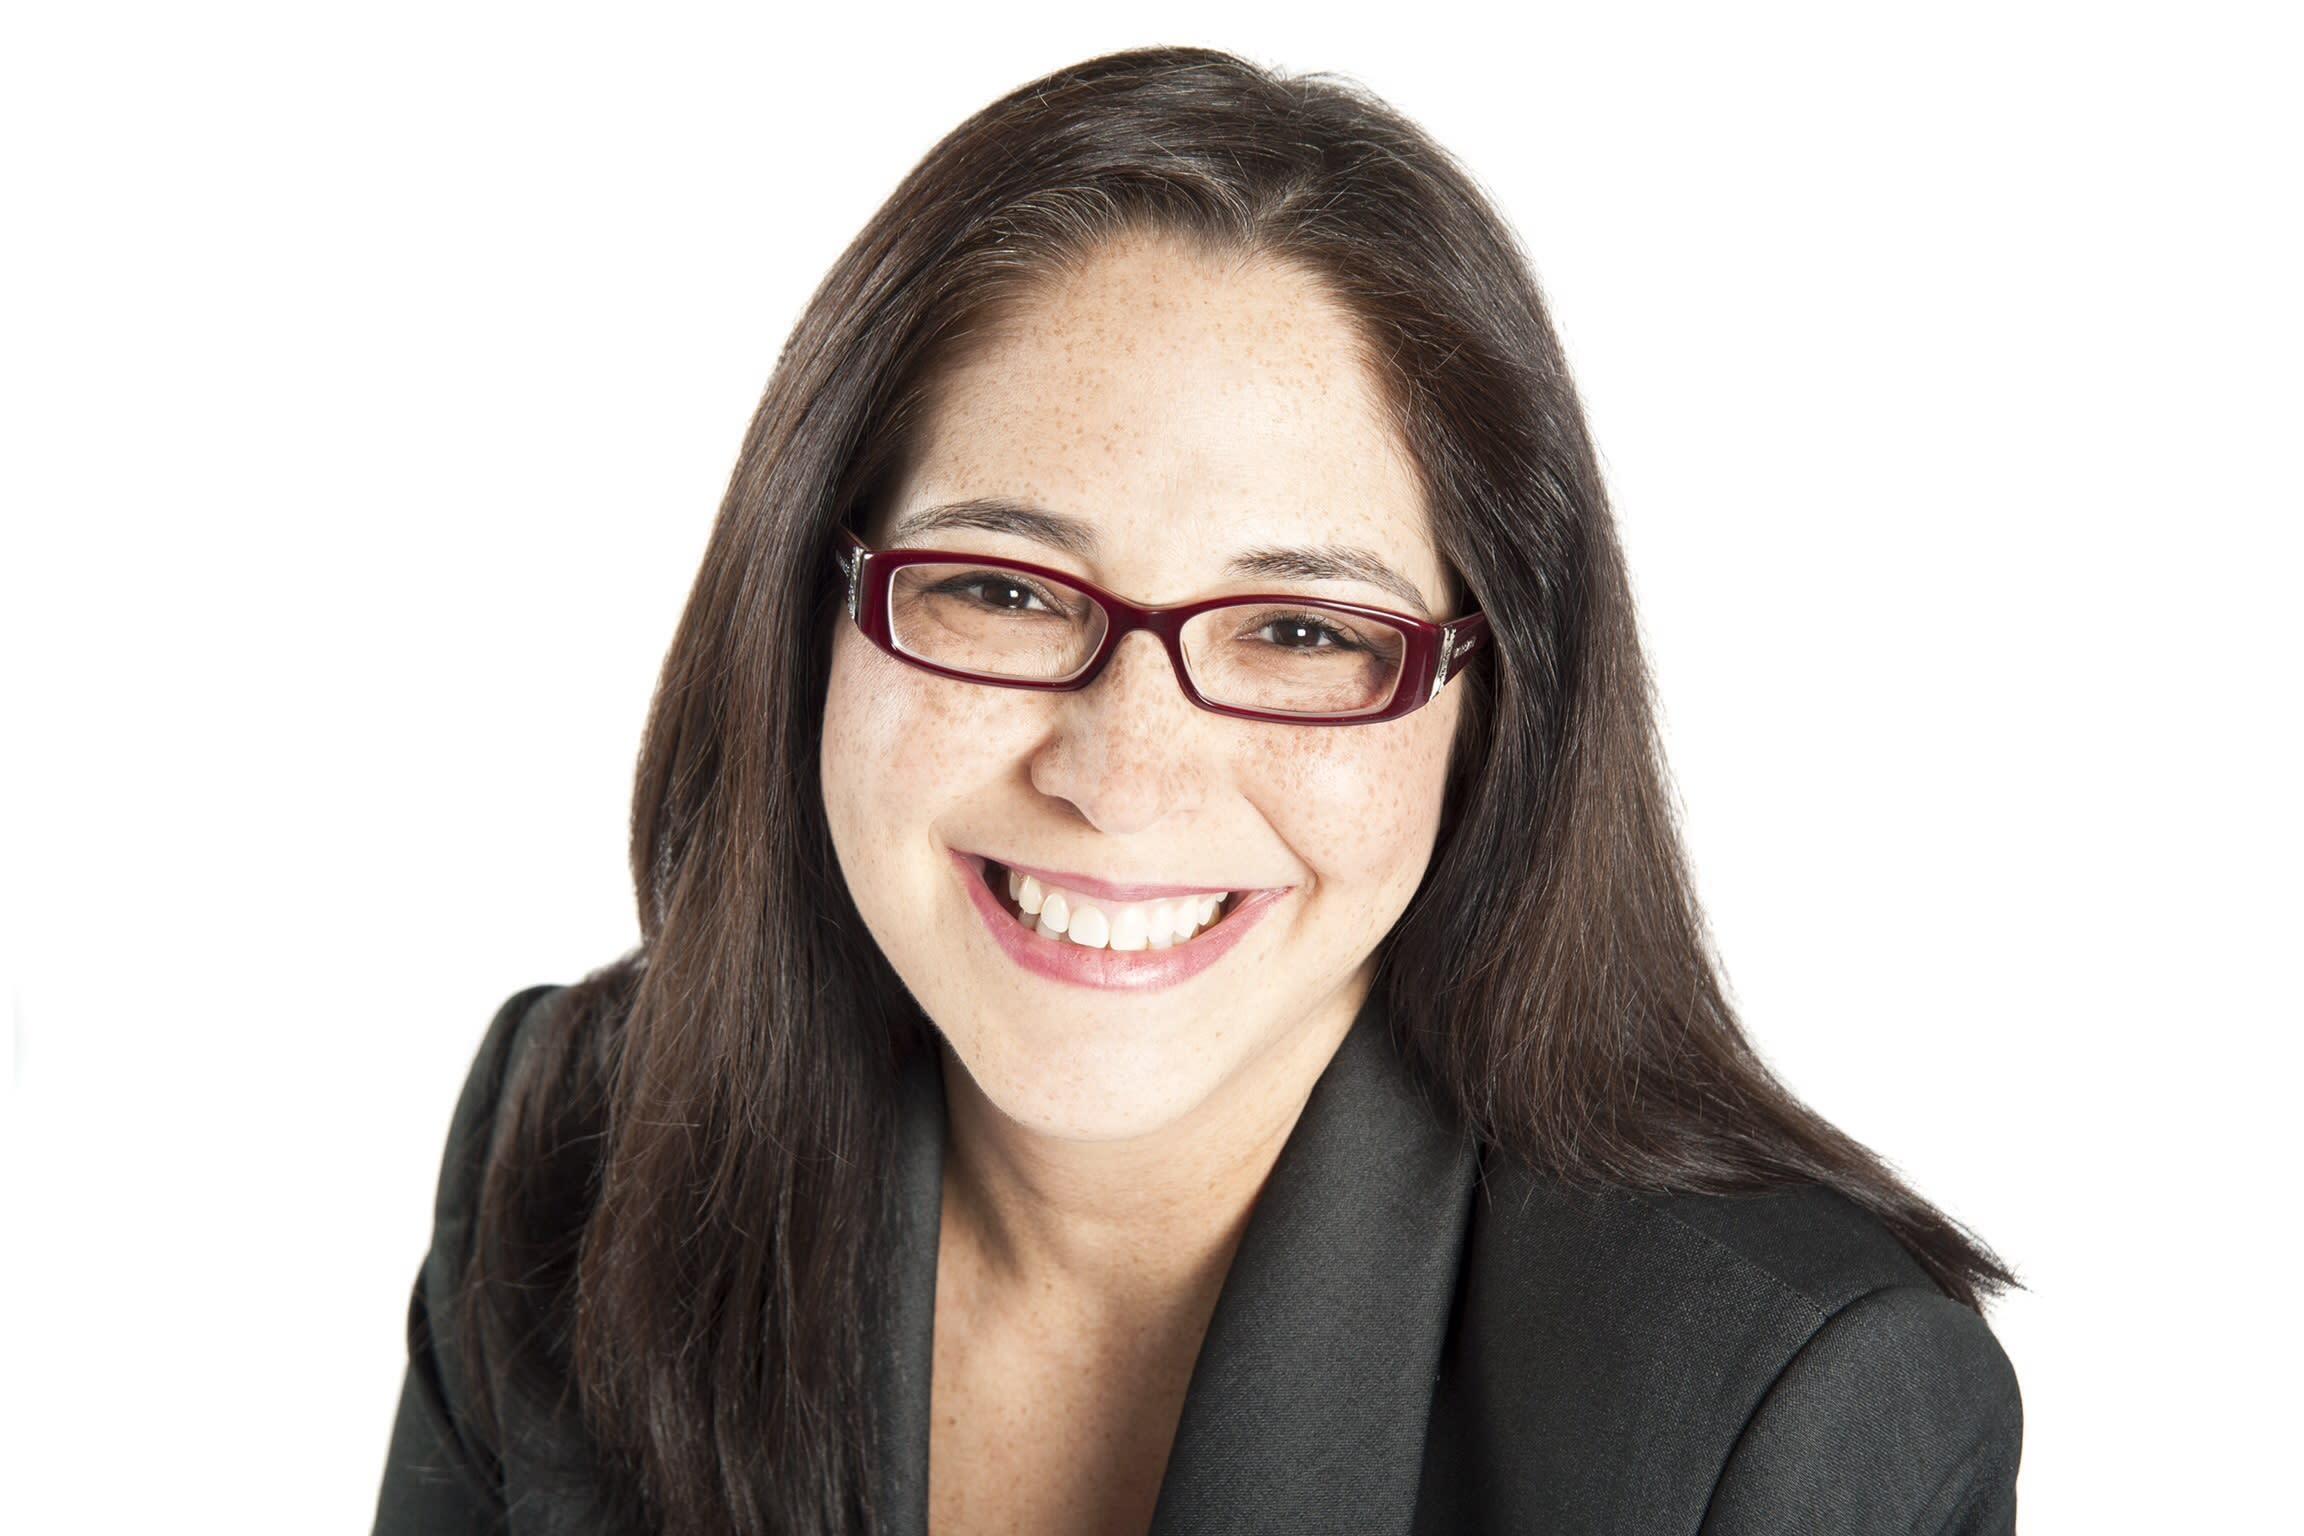 Denise Furlong